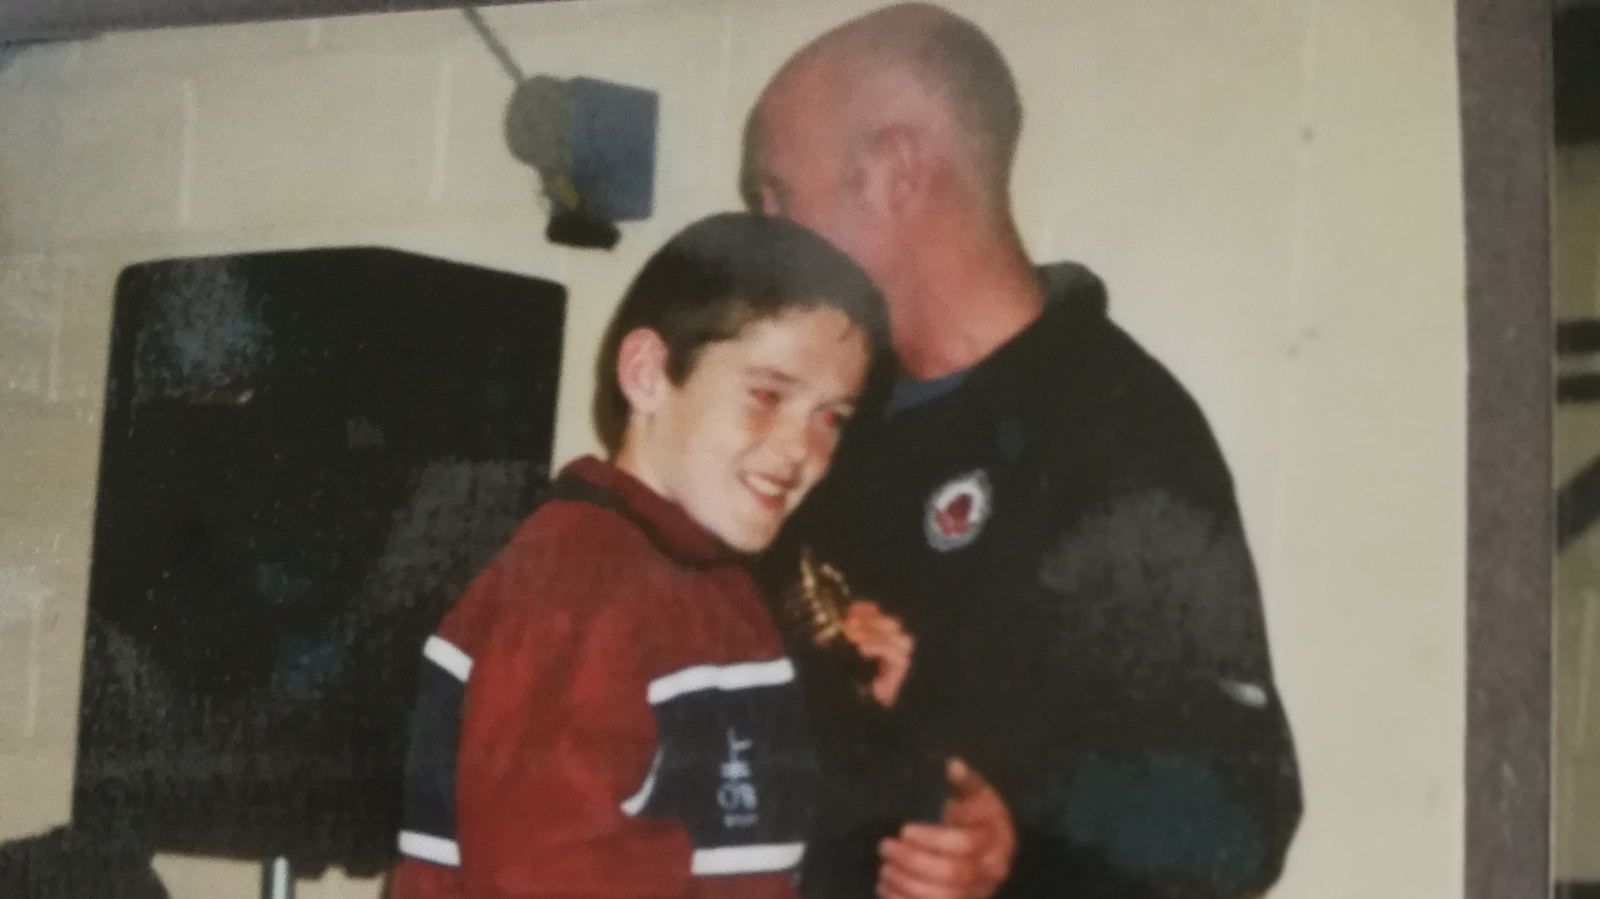 Image - Fenton receives his U12 winner's medal from Dr Noel McCaffrey, Jack's father